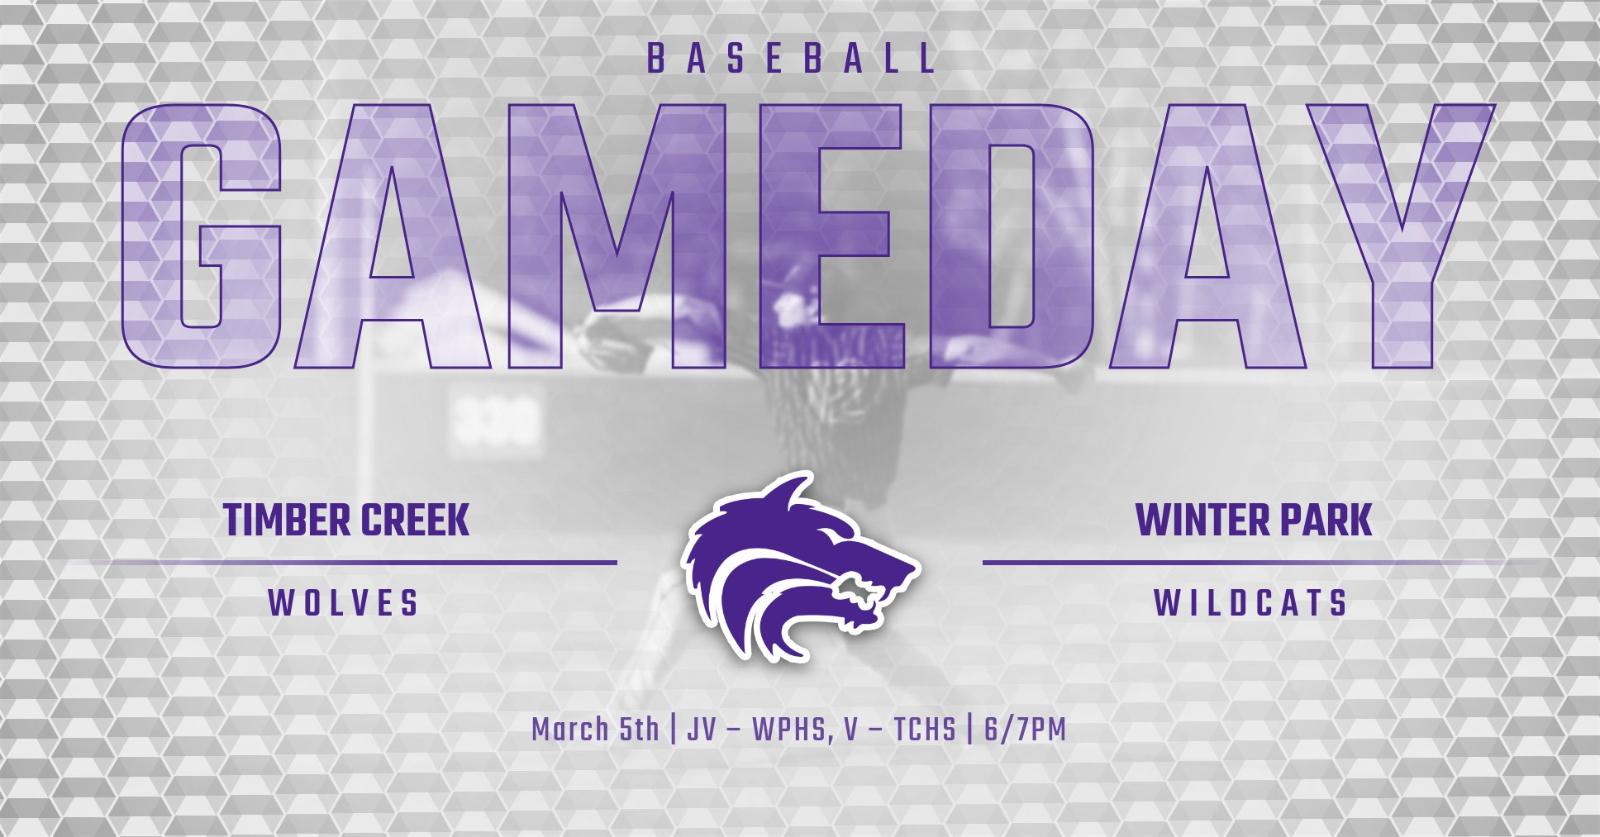 Baseball | GAMEDAY vs Winter Park Wildcats